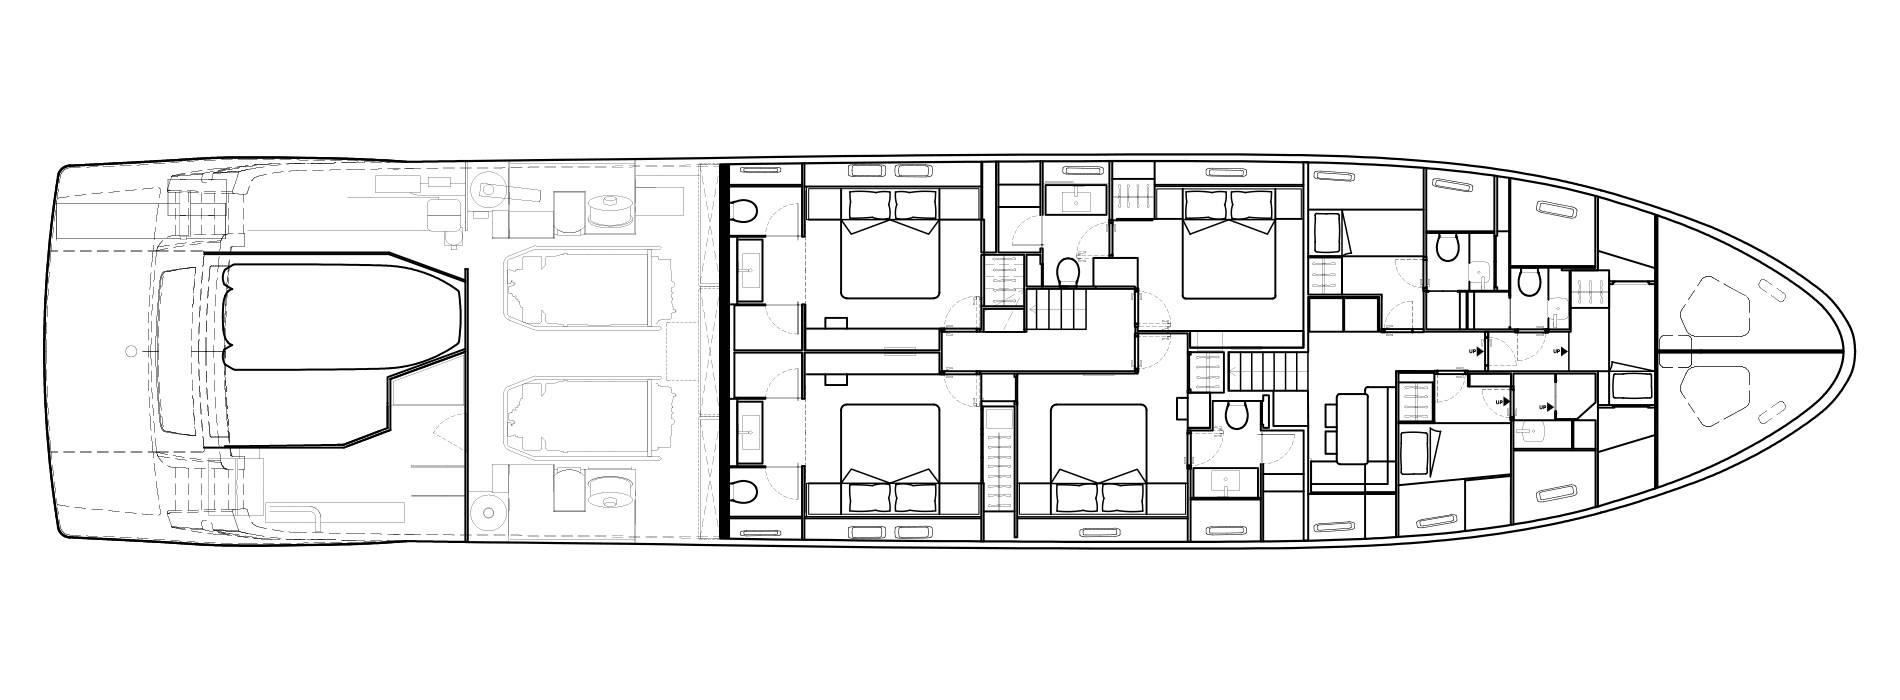 Sanlorenzo Yachts SL106 Lower Deck